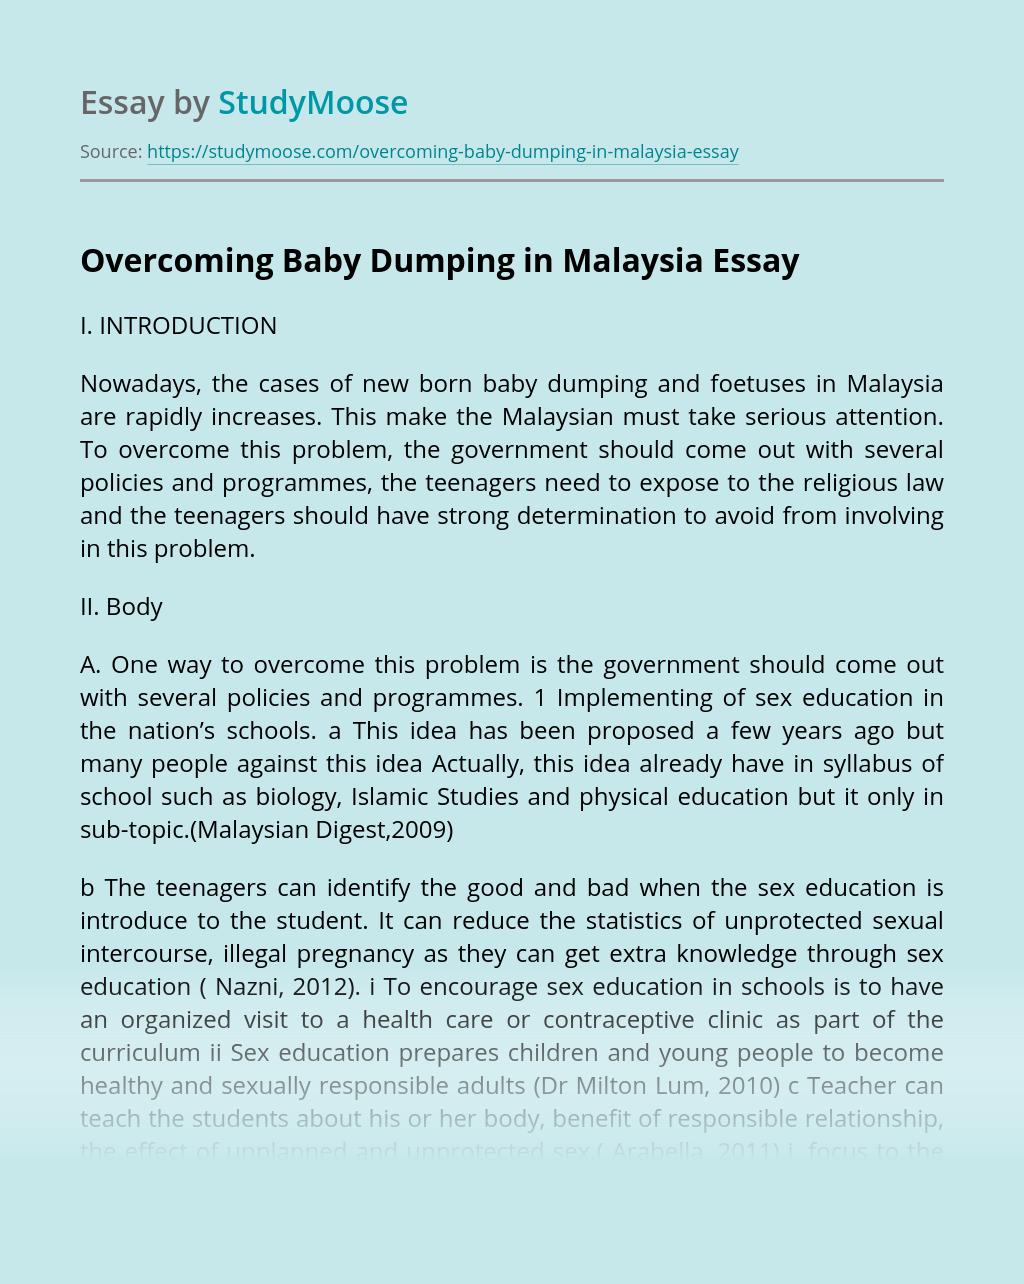 Overcoming Baby Dumping in Malaysia